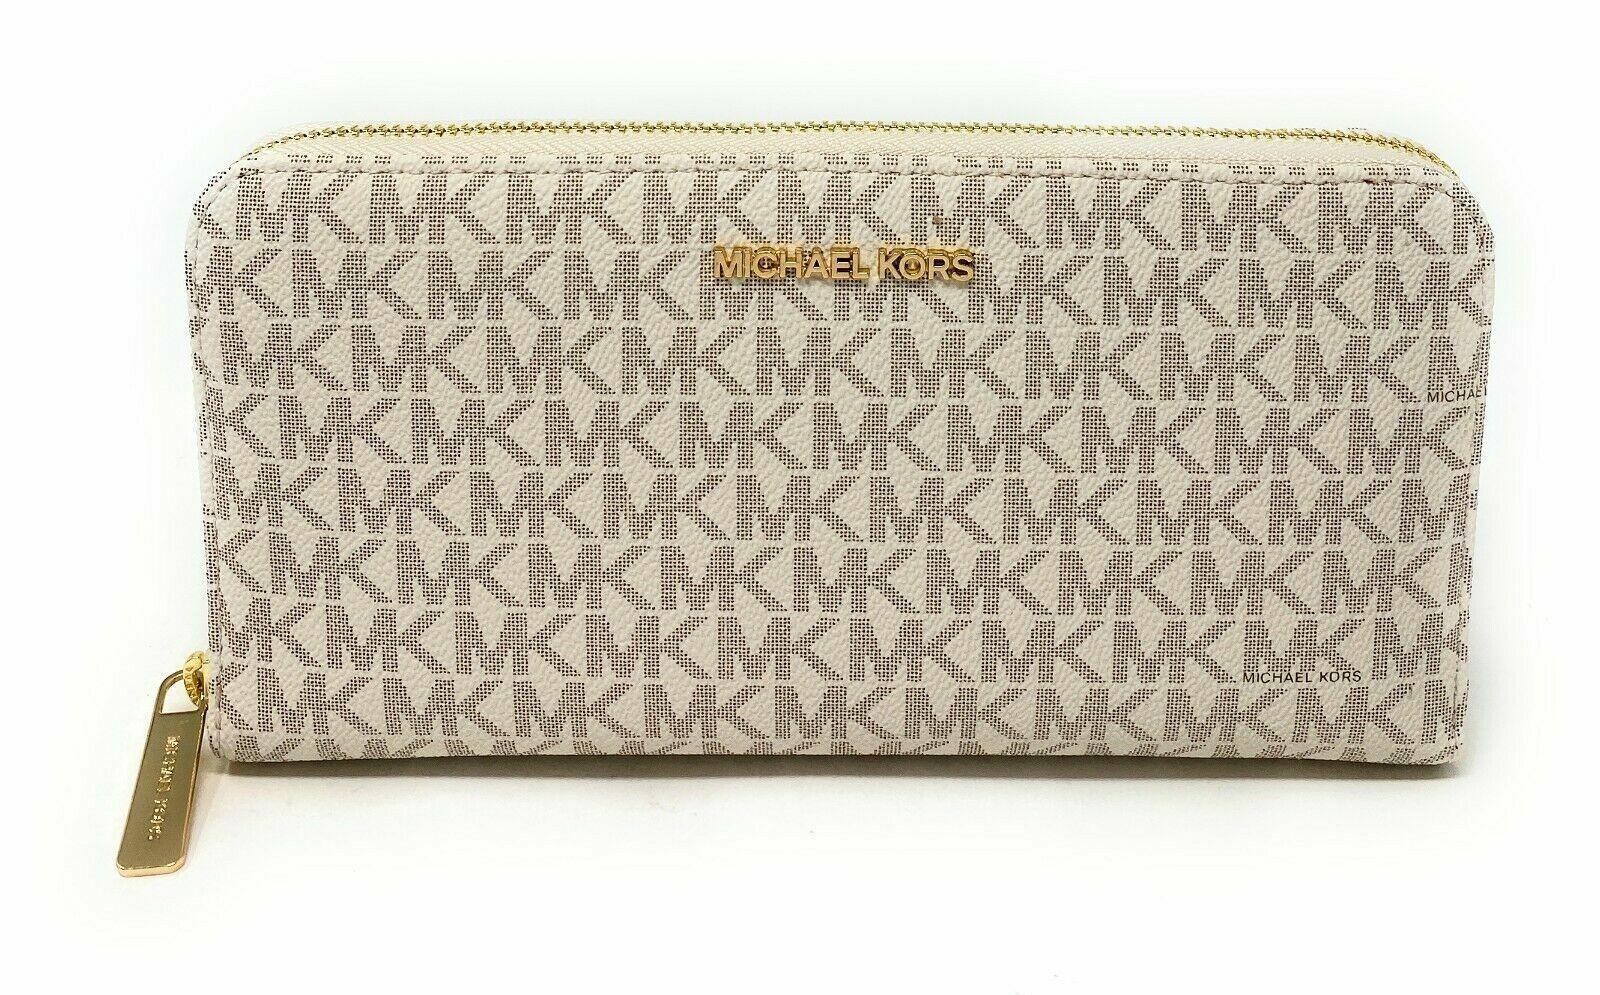 Michael Kors Jet Set Travel XL Zip Around Wallet PVC Leather Signature